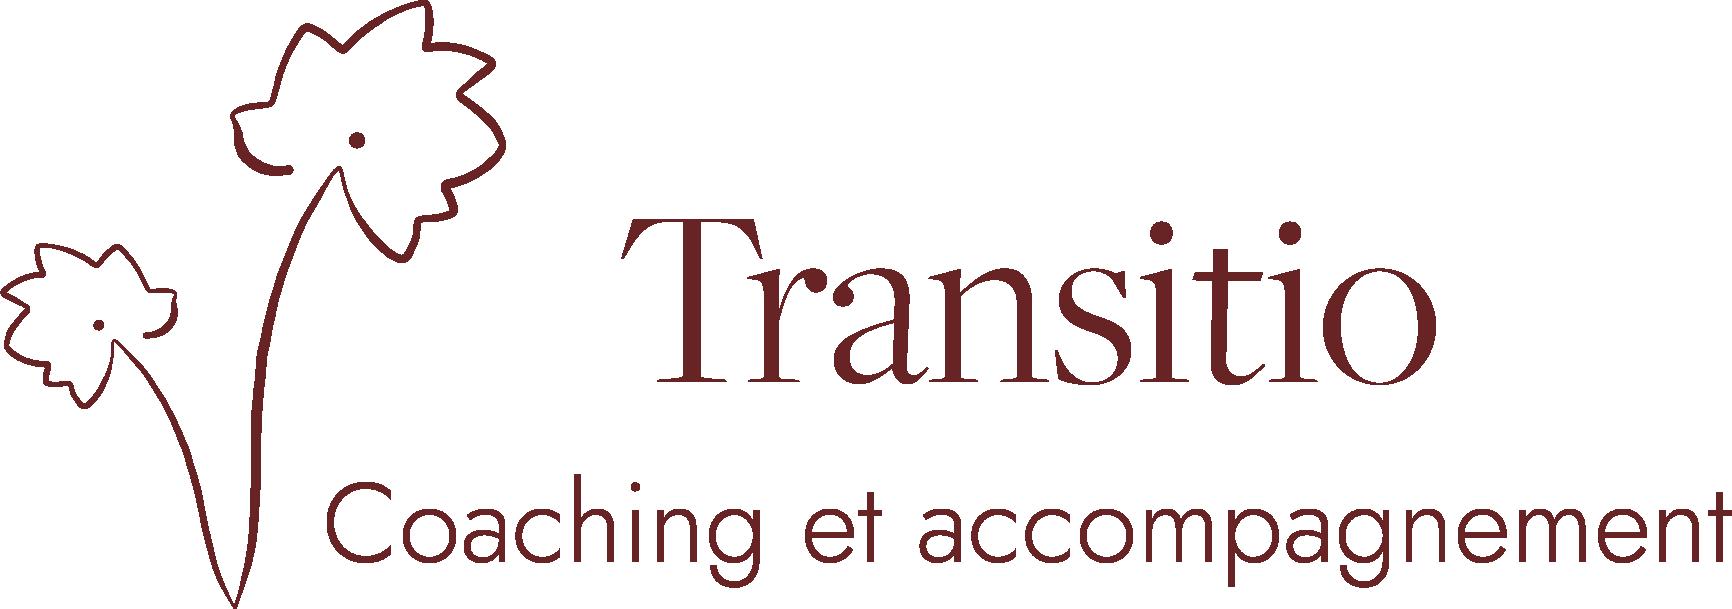 Coaching - Accompagnement au changement - Organisation  :  Transitio